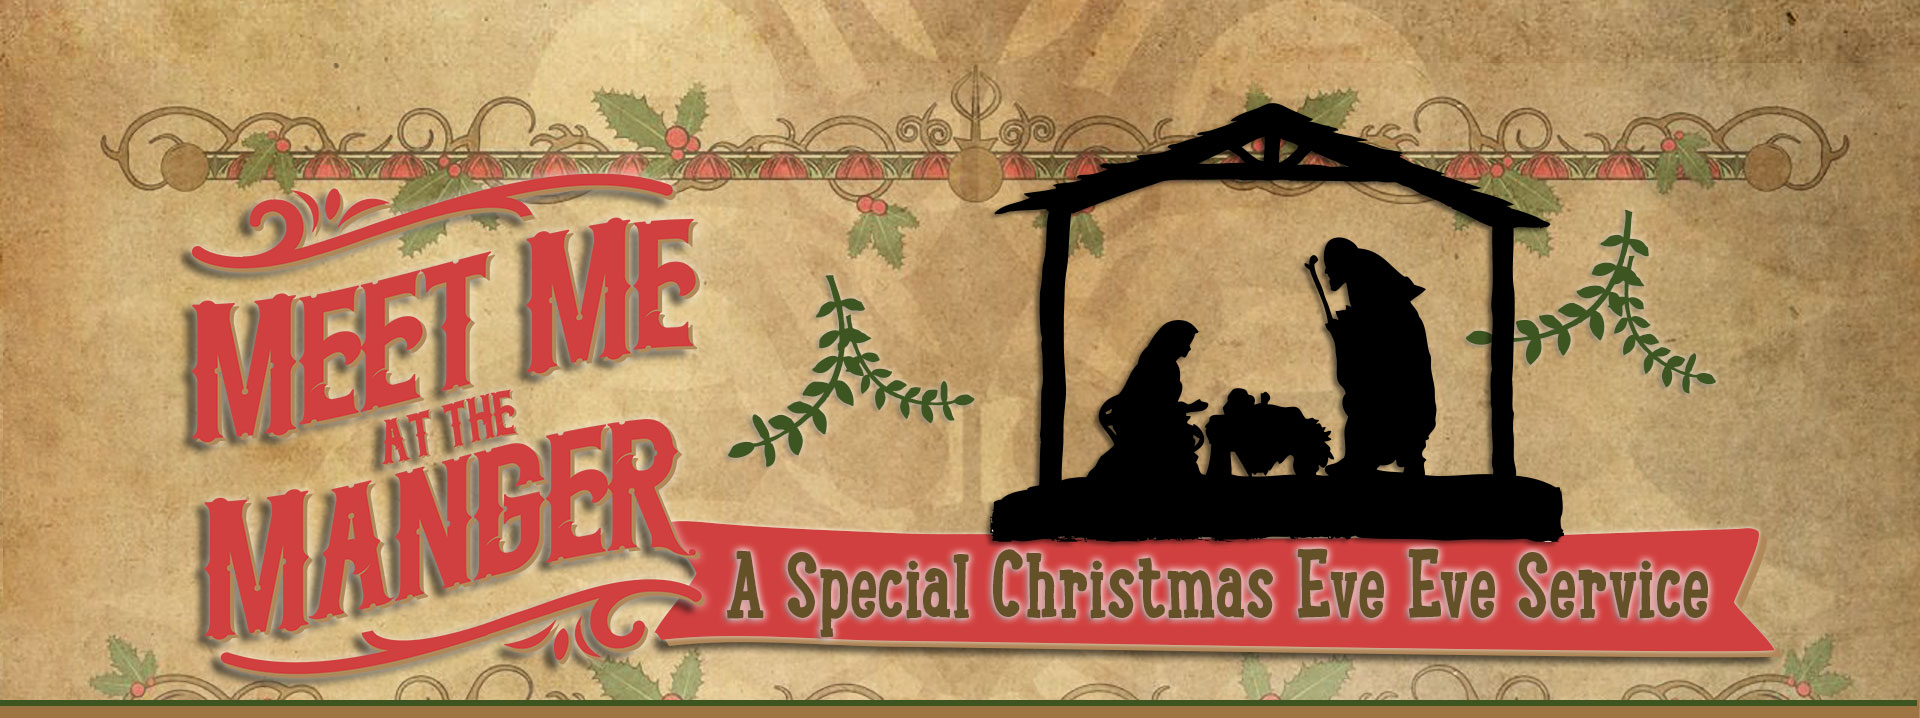 Christmas Eve Eve 2014